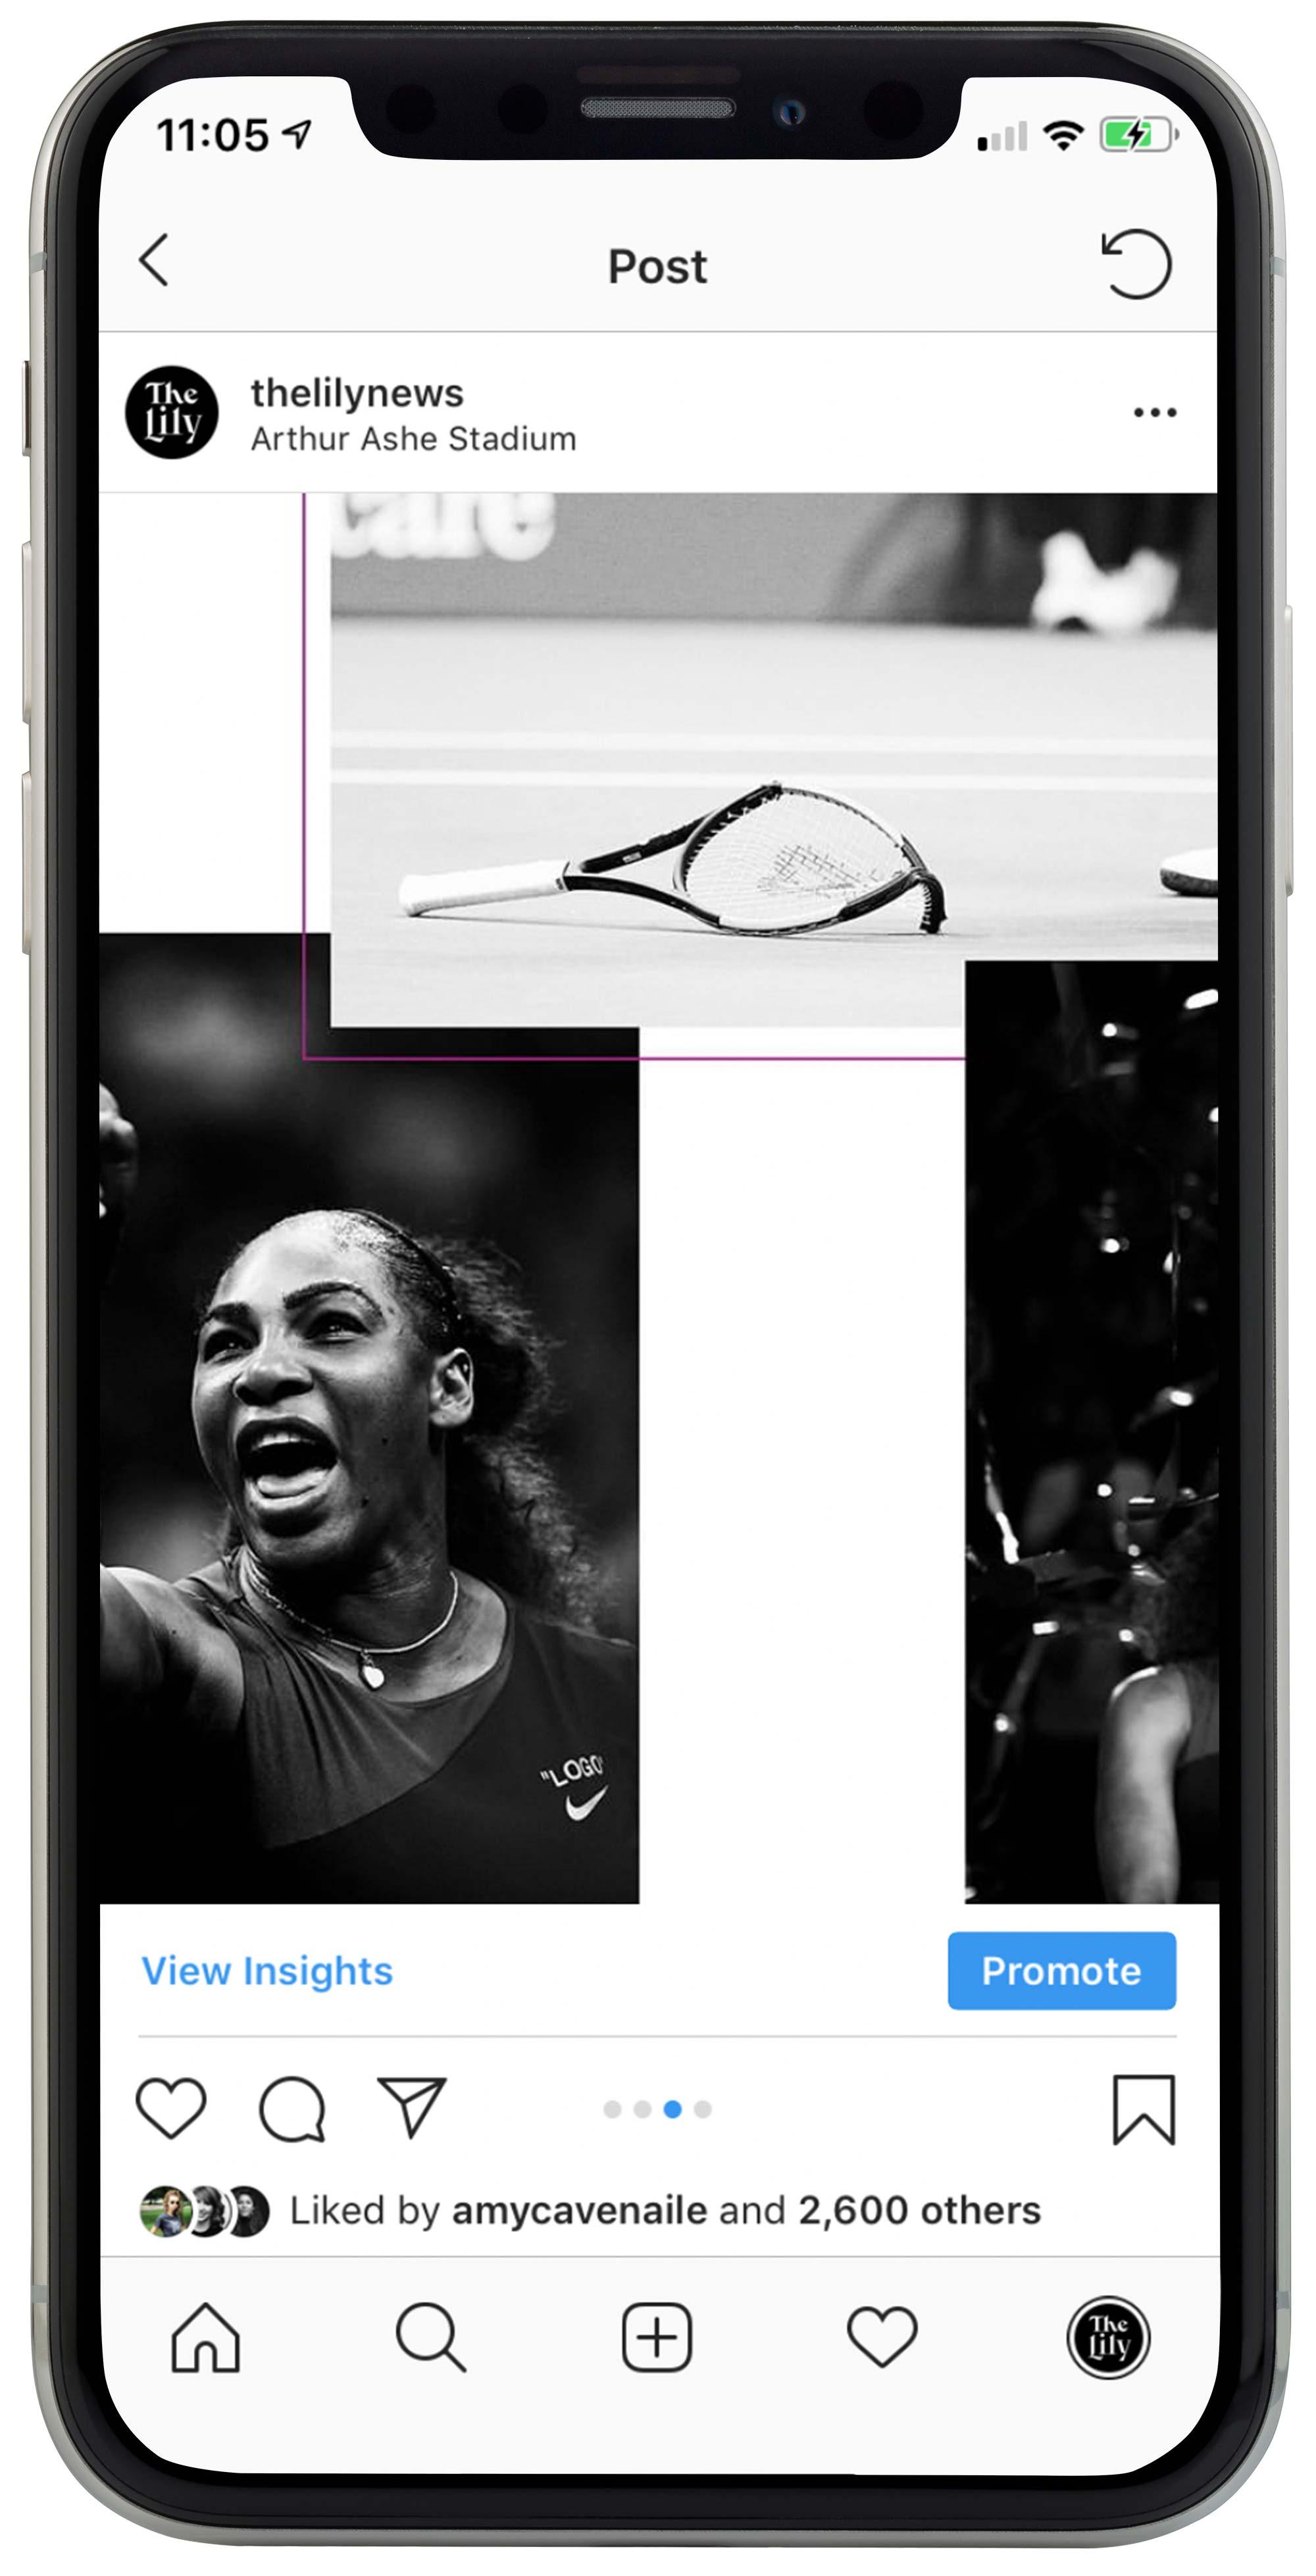 IGProper-Serena03.jpg